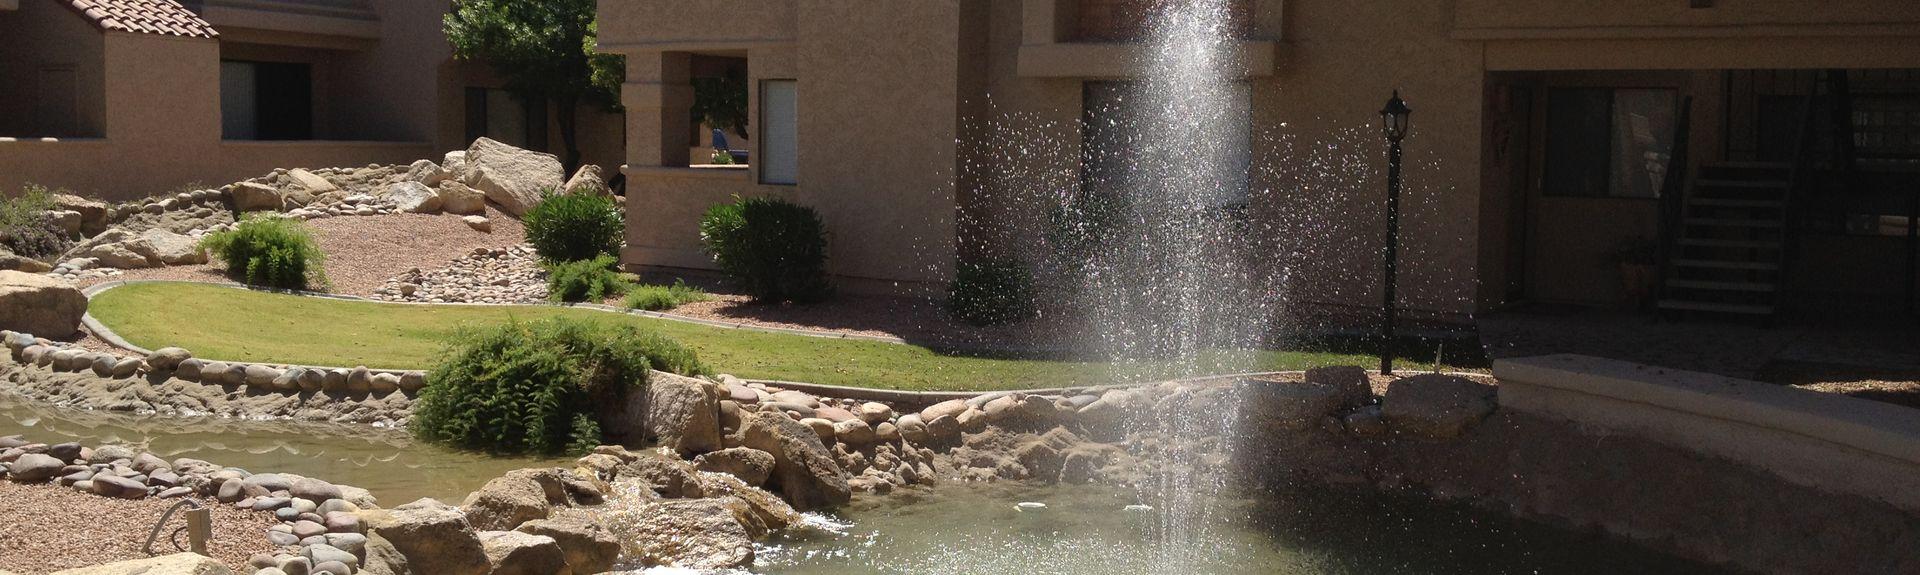 The Villages, Scottsdale, AZ, USA